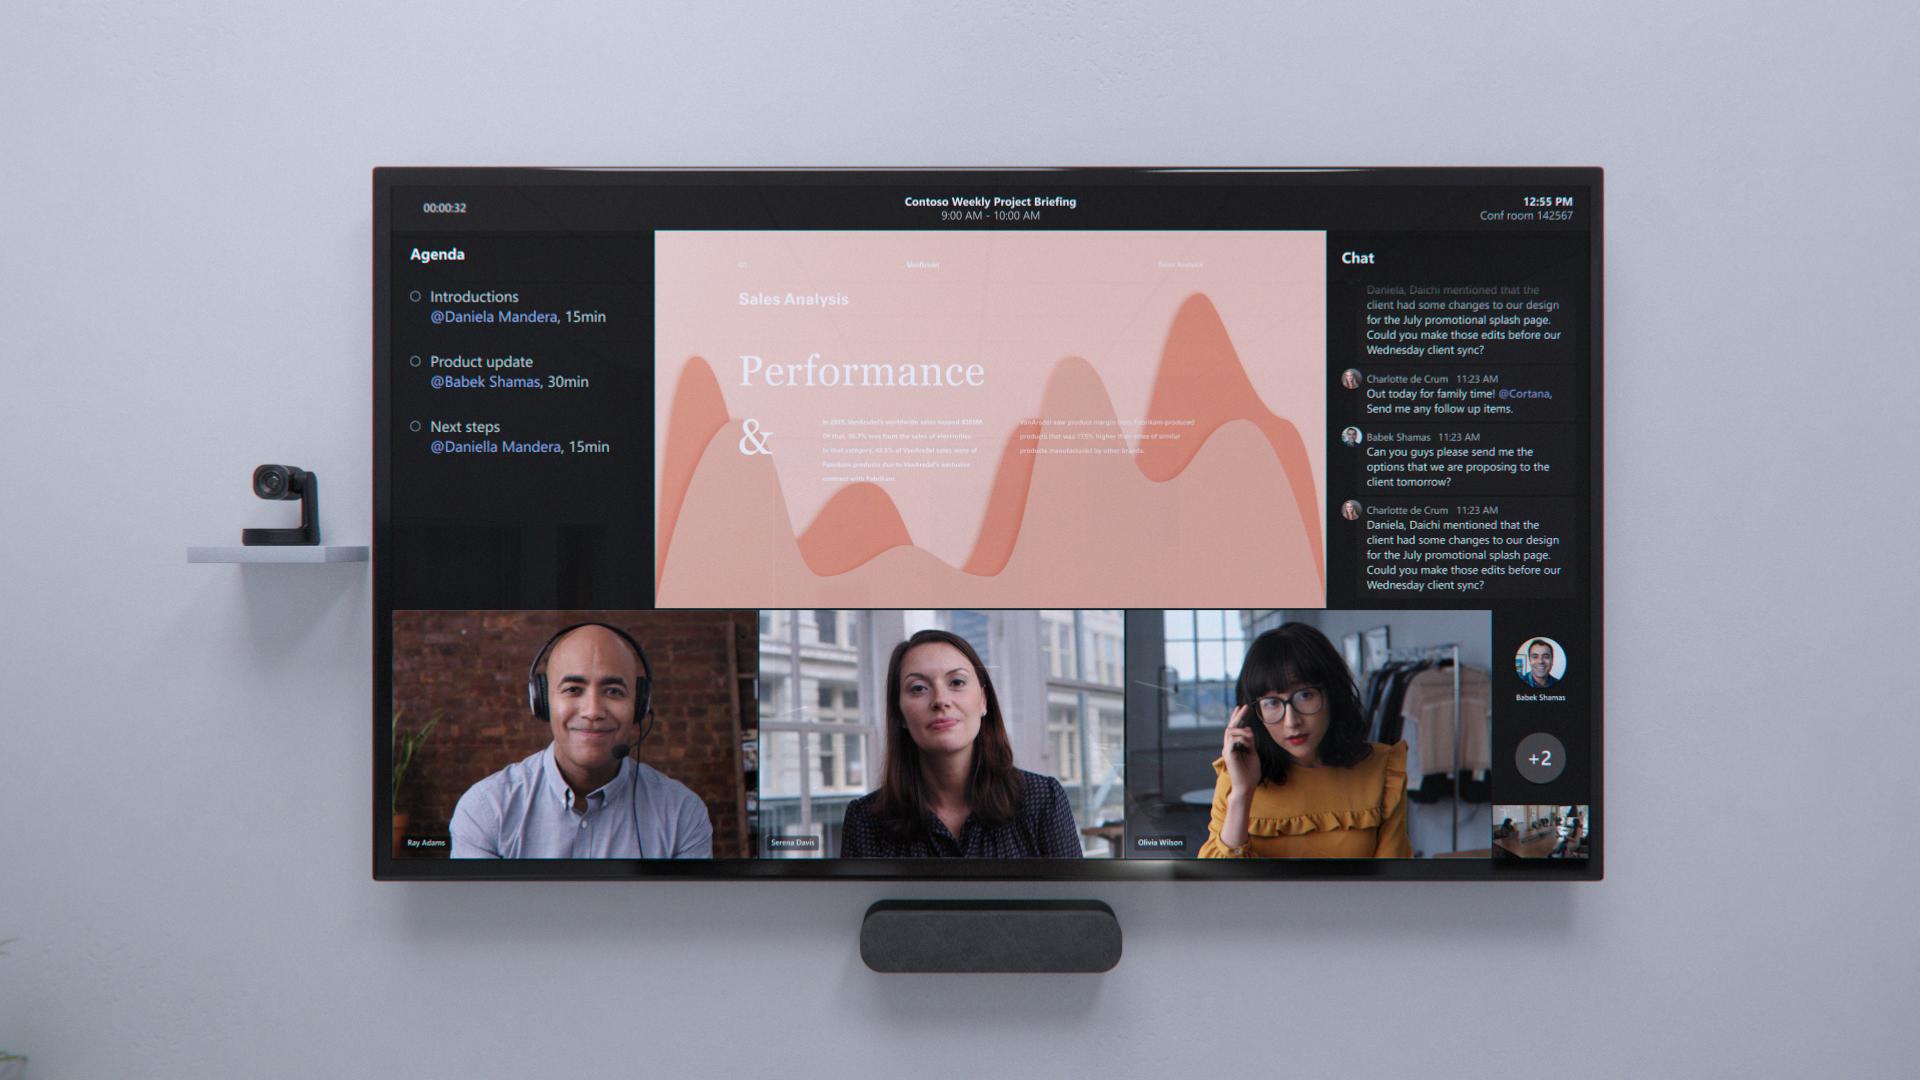 Actualizaciones de Microsoft Team Hybrid Office